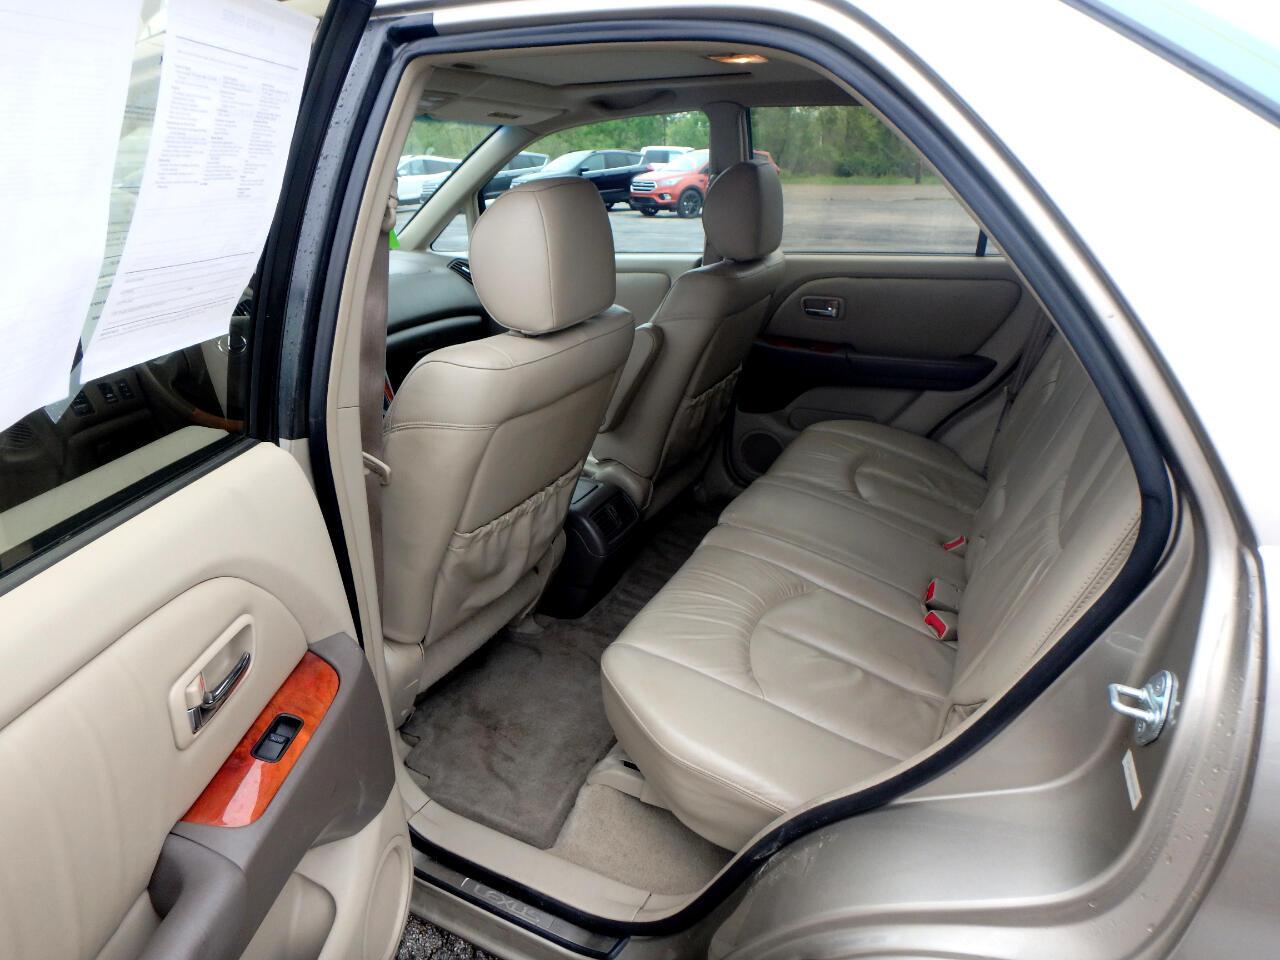 2001 Lexus RX 300 4dr SUV 4WD